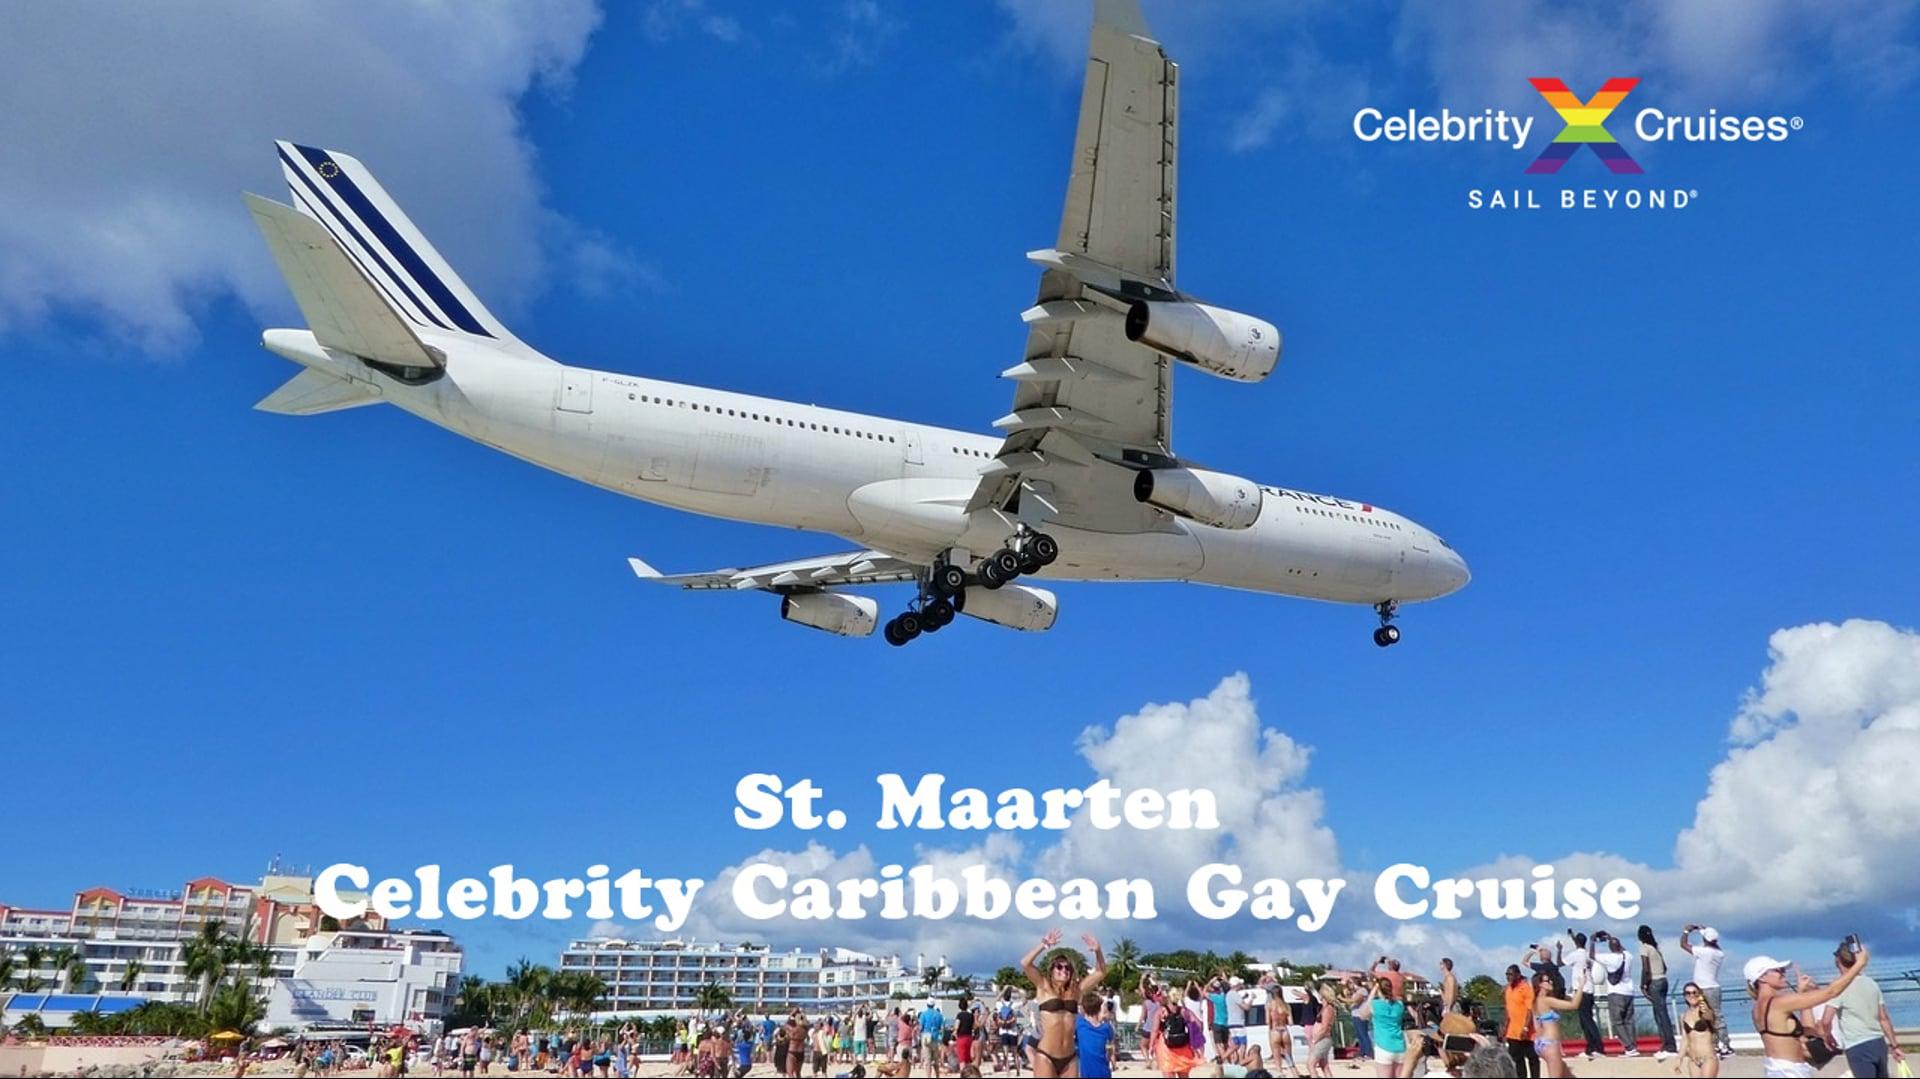 rencontre ado gay cruise à Saint Martin dHères